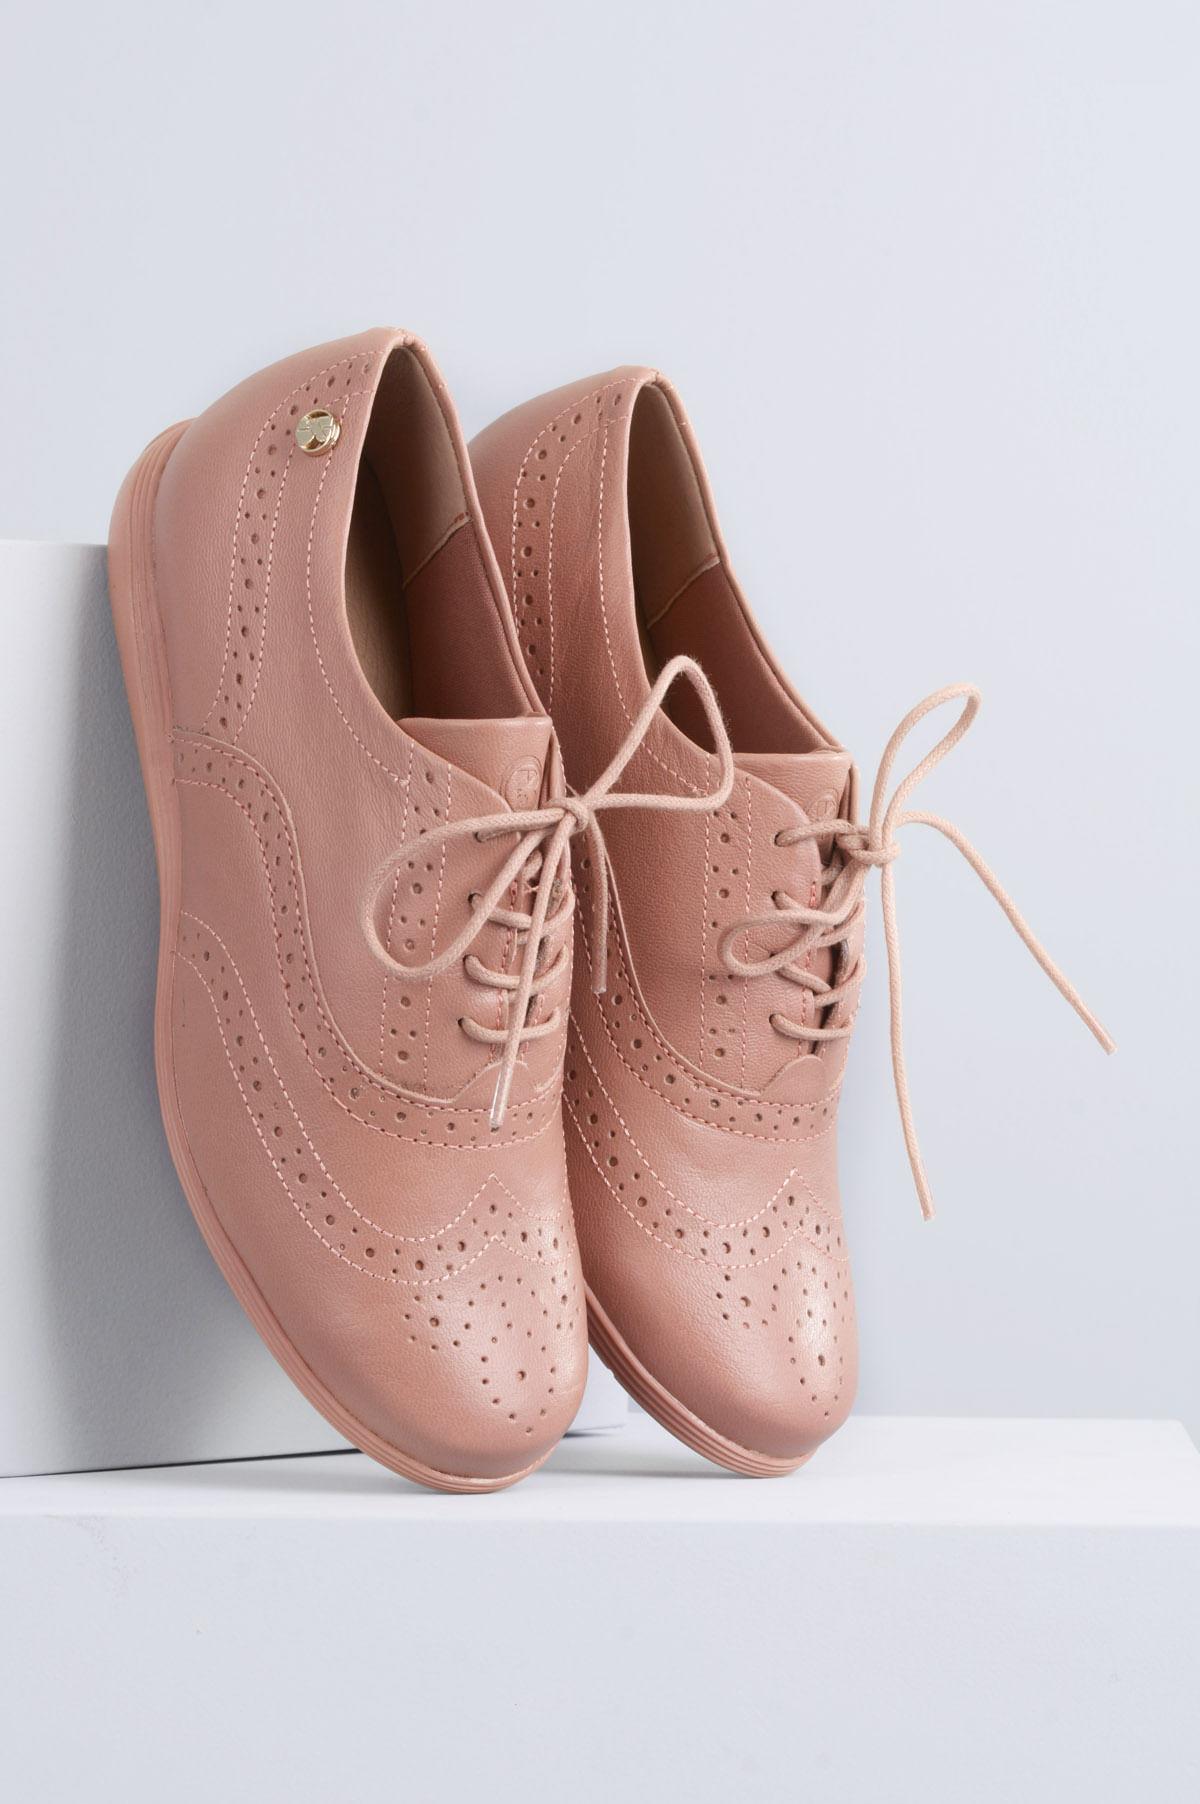 39321c5bb Oxford Feminino Lyra Bottero CR - ROSA - Mundial Calçados